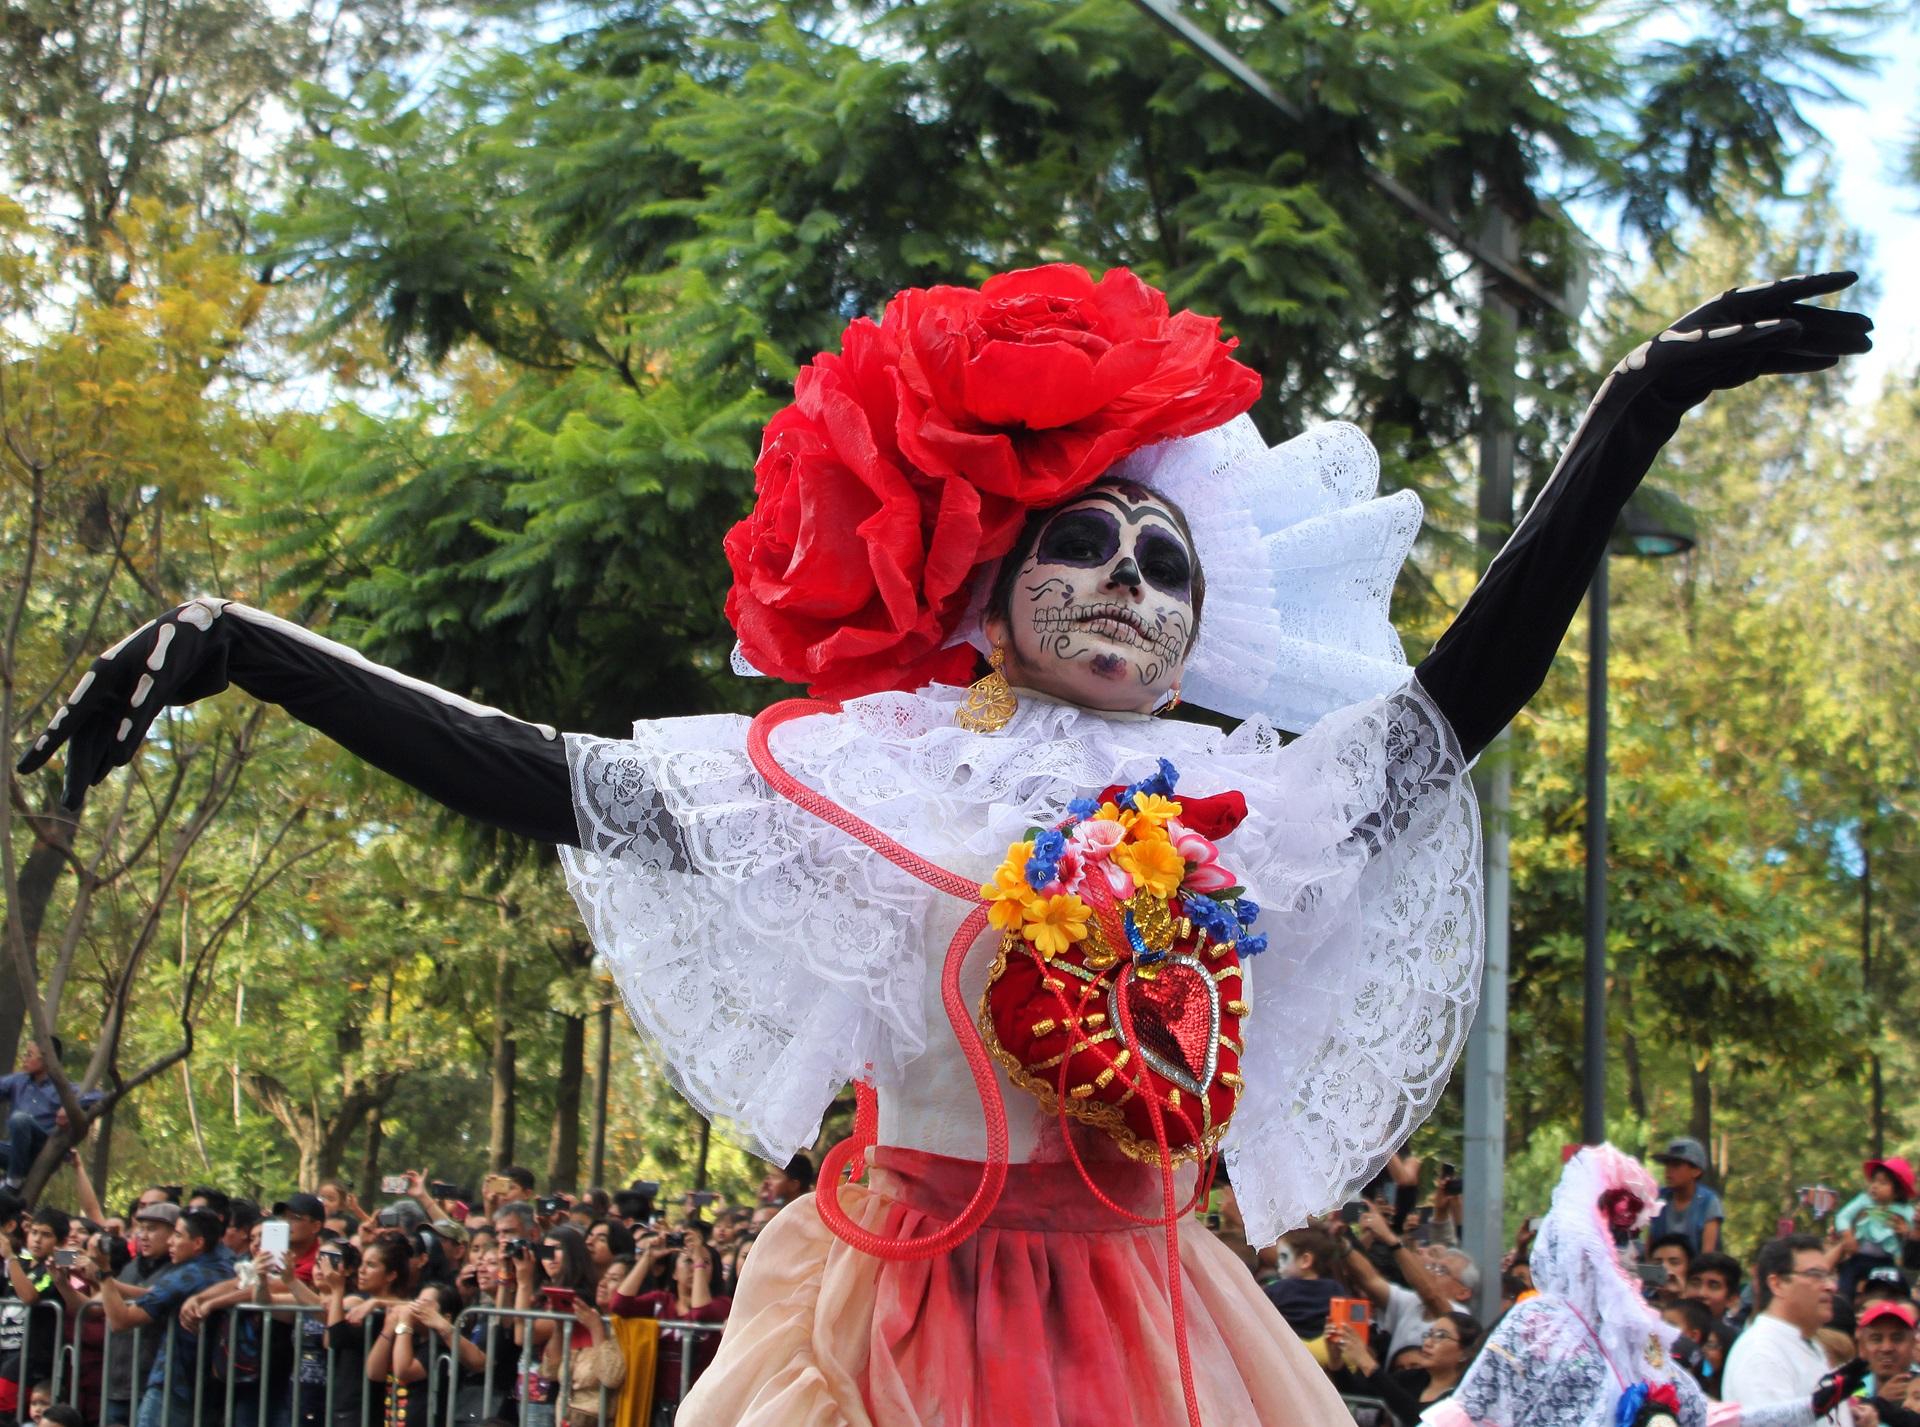 Día de Muertos, also known as Day of the Dead in Mexico